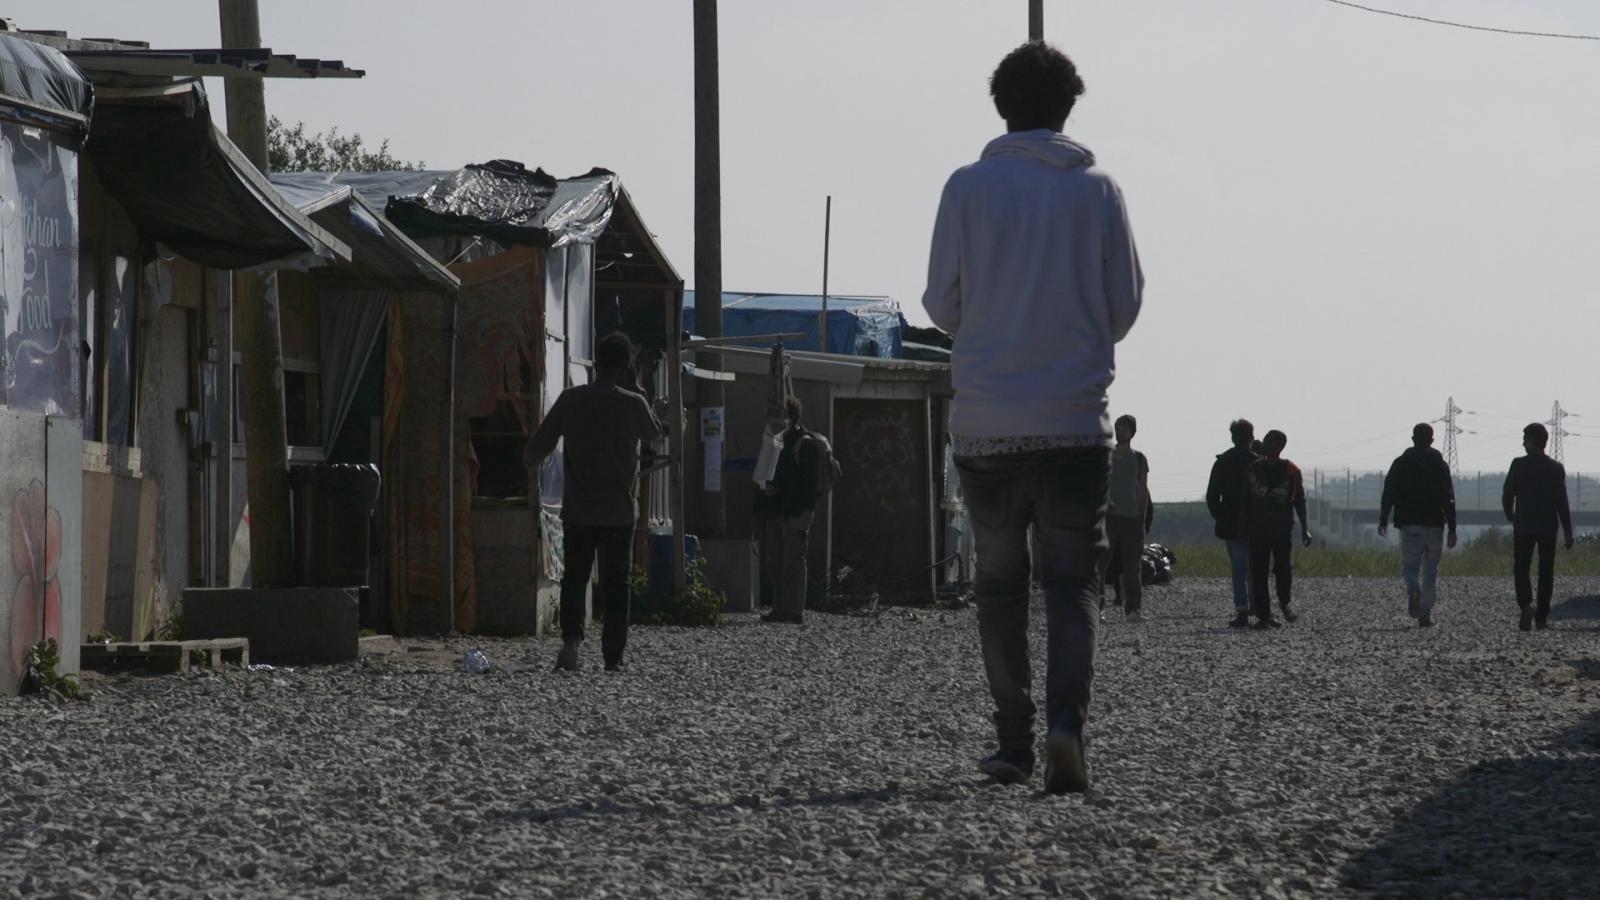 British motorist 'runs over and kills migrant' in Calais